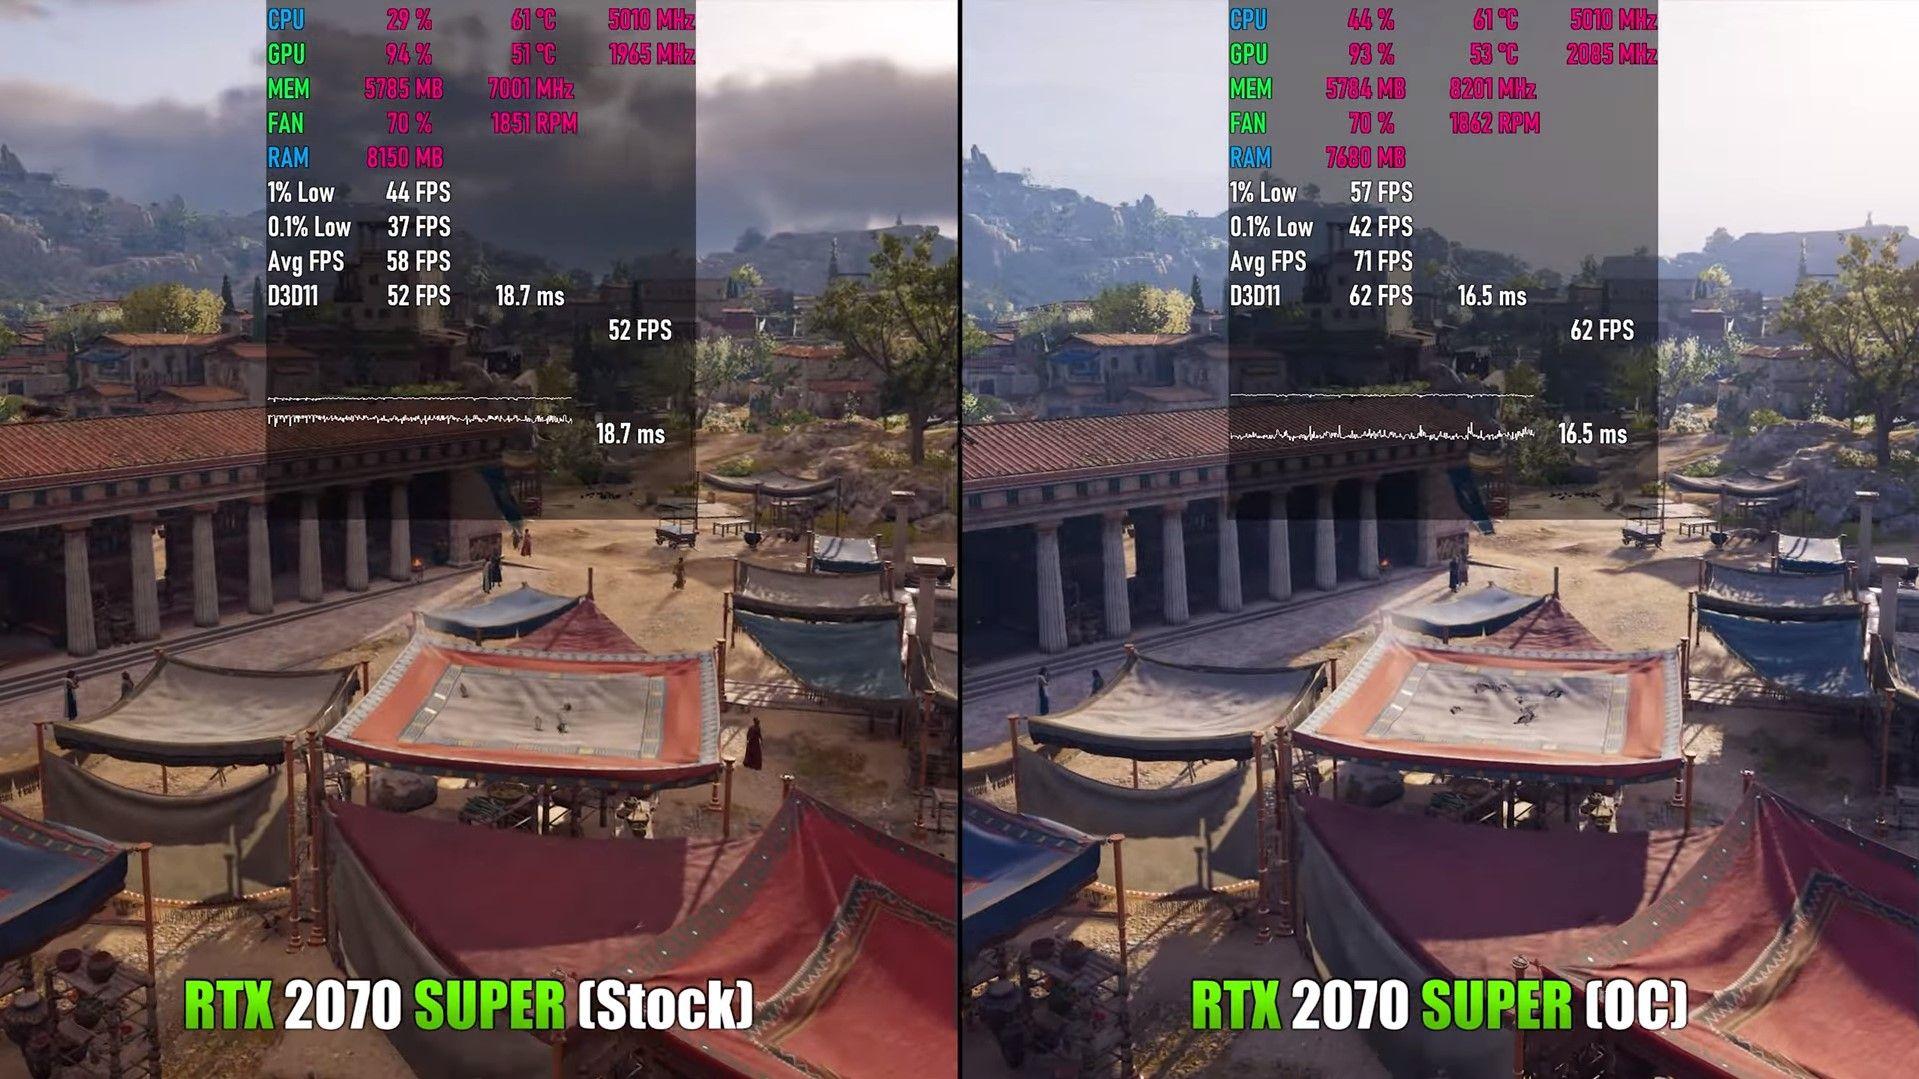 RTX 2070 Super Overclocked vs Stocked